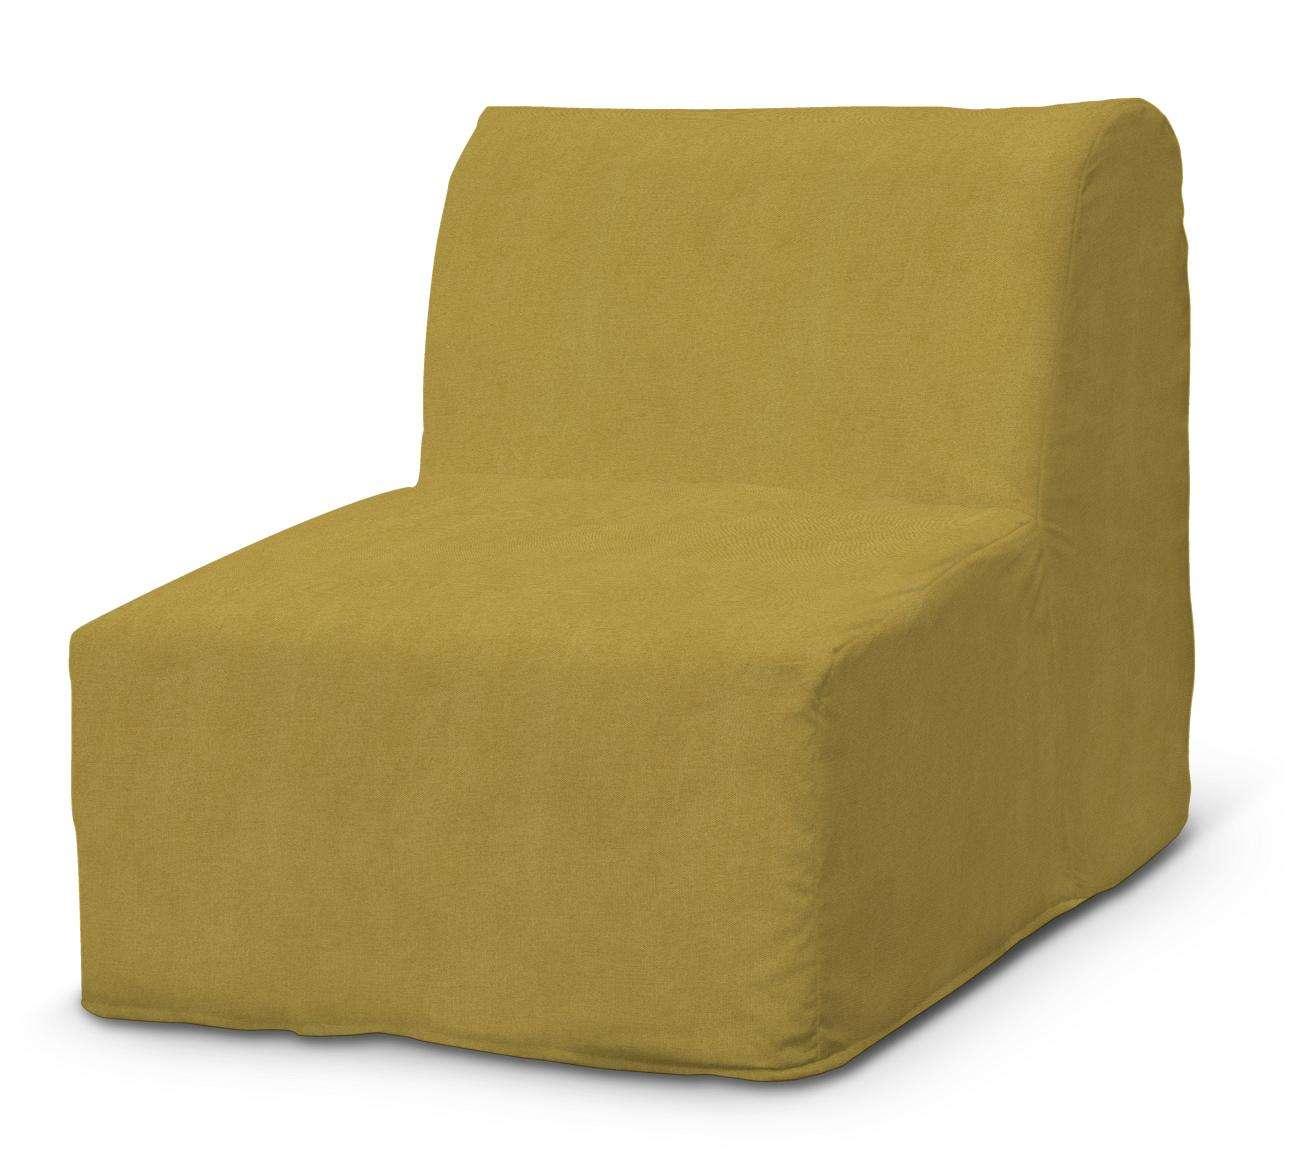 Pokrowiec na fotel Lycksele prosty fotel Lycksele w kolekcji Etna , tkanina: 705-04